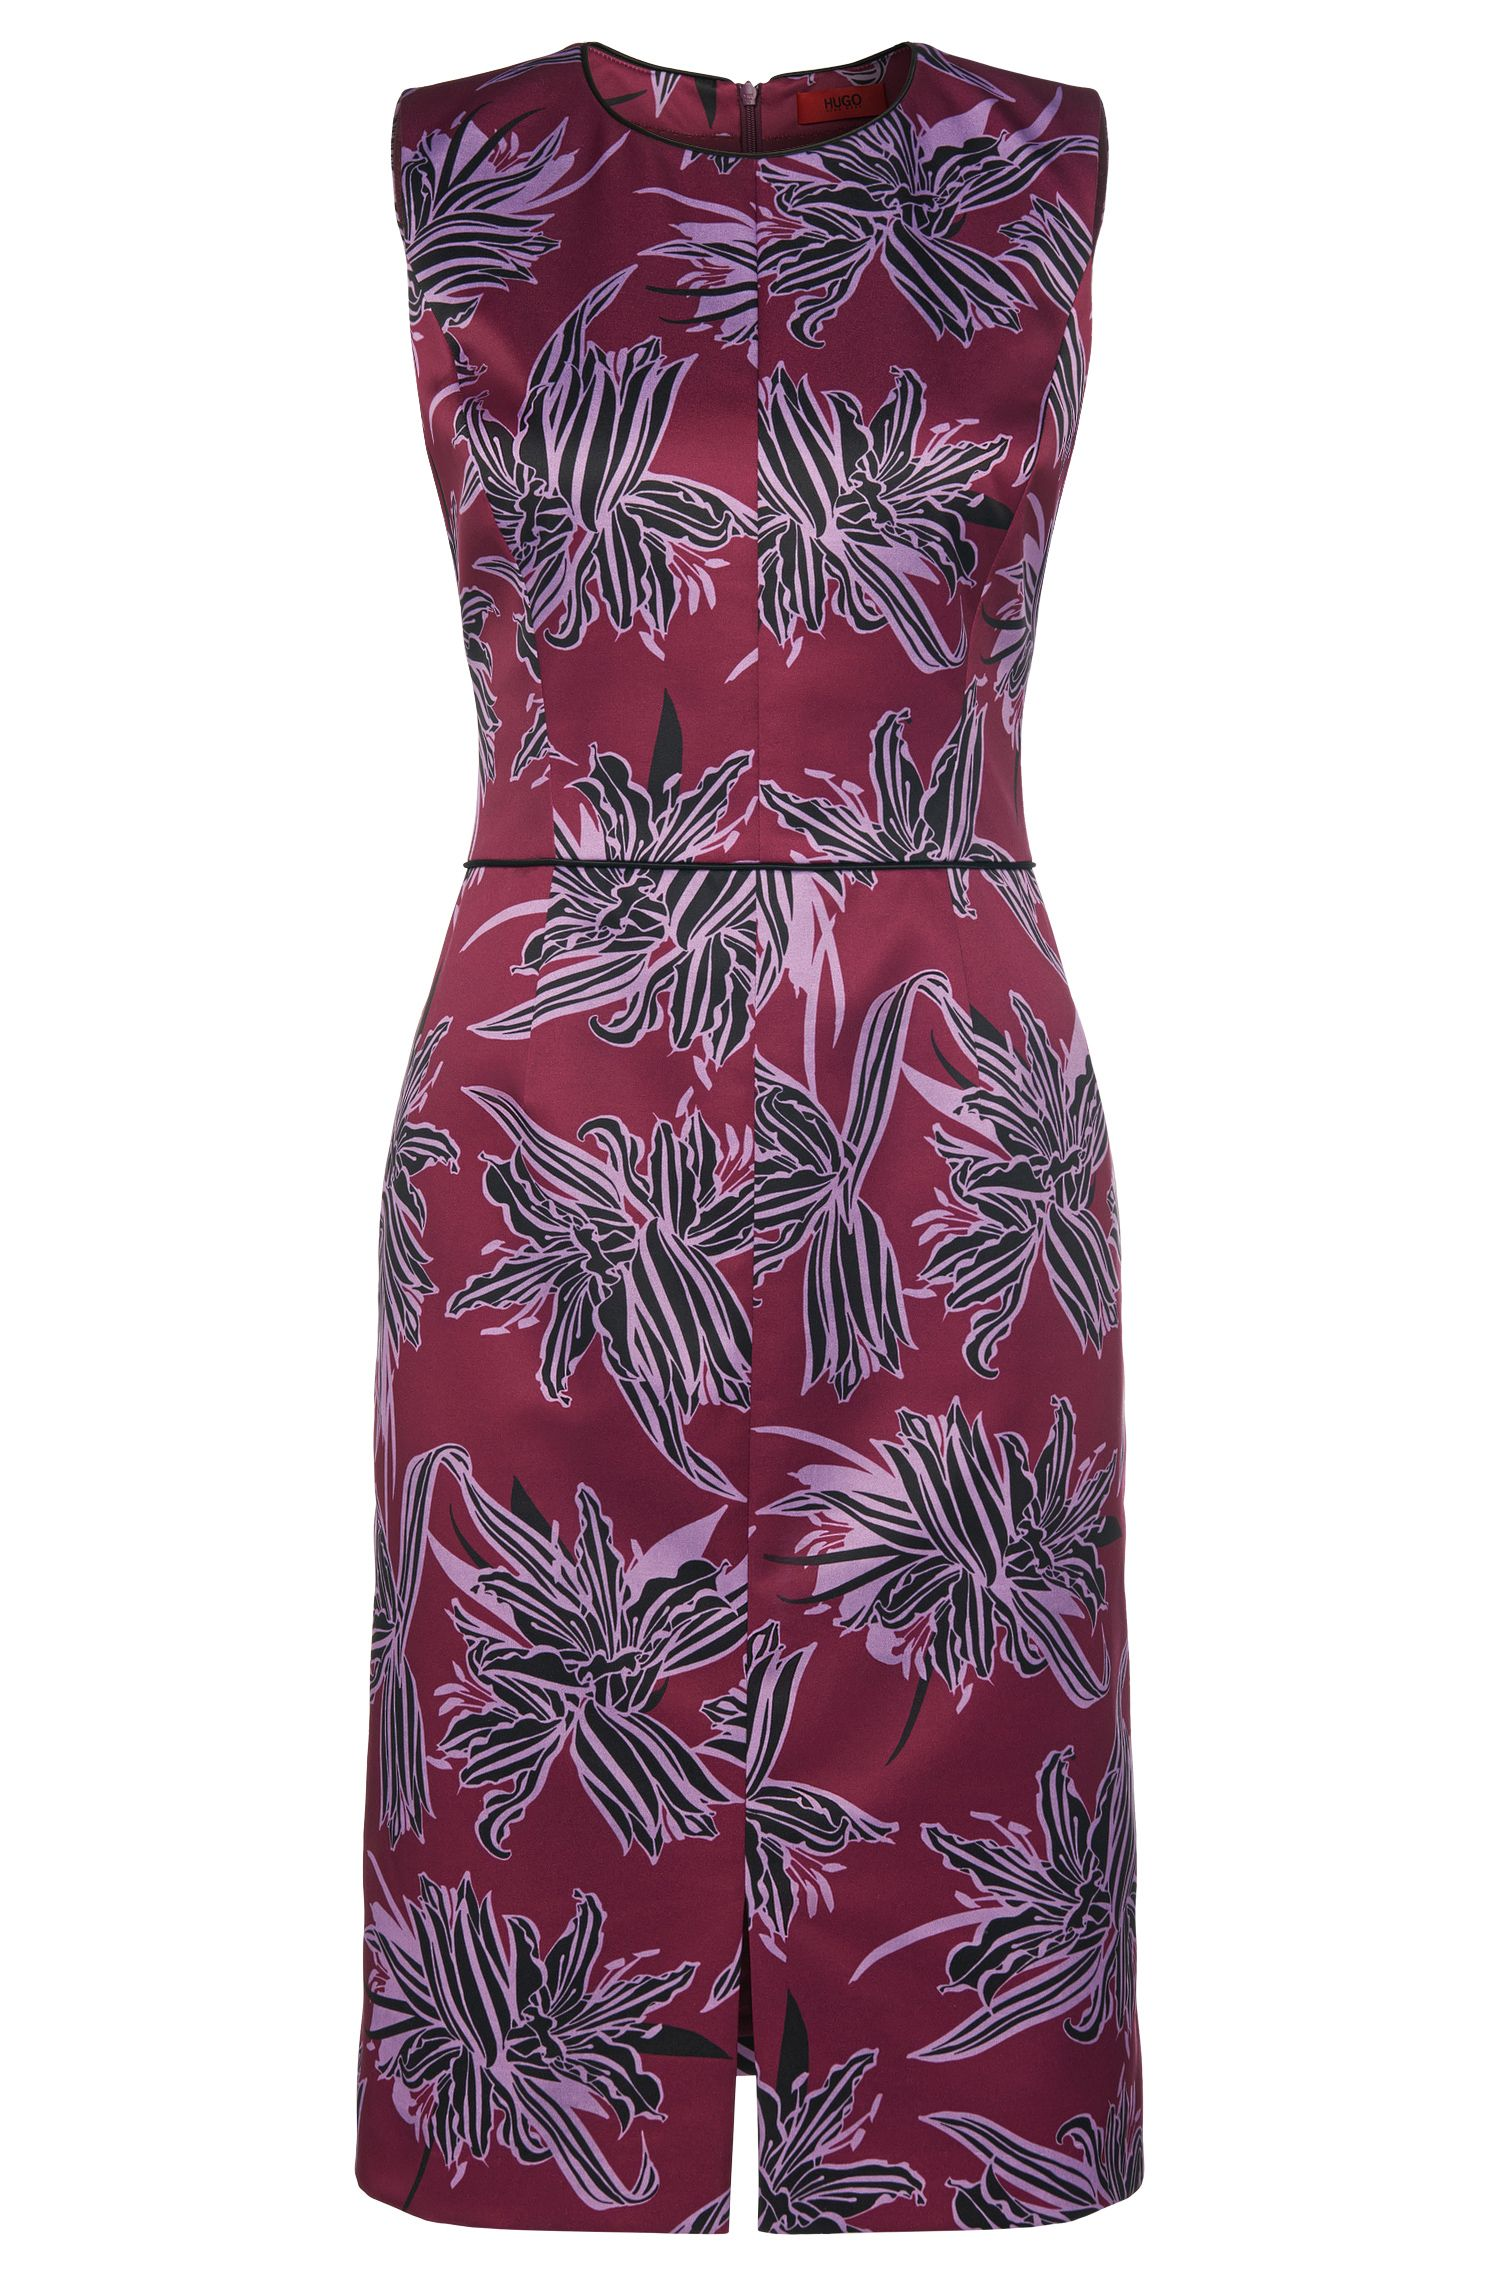 'Klenni' | Stretch Satin Sheath Dress